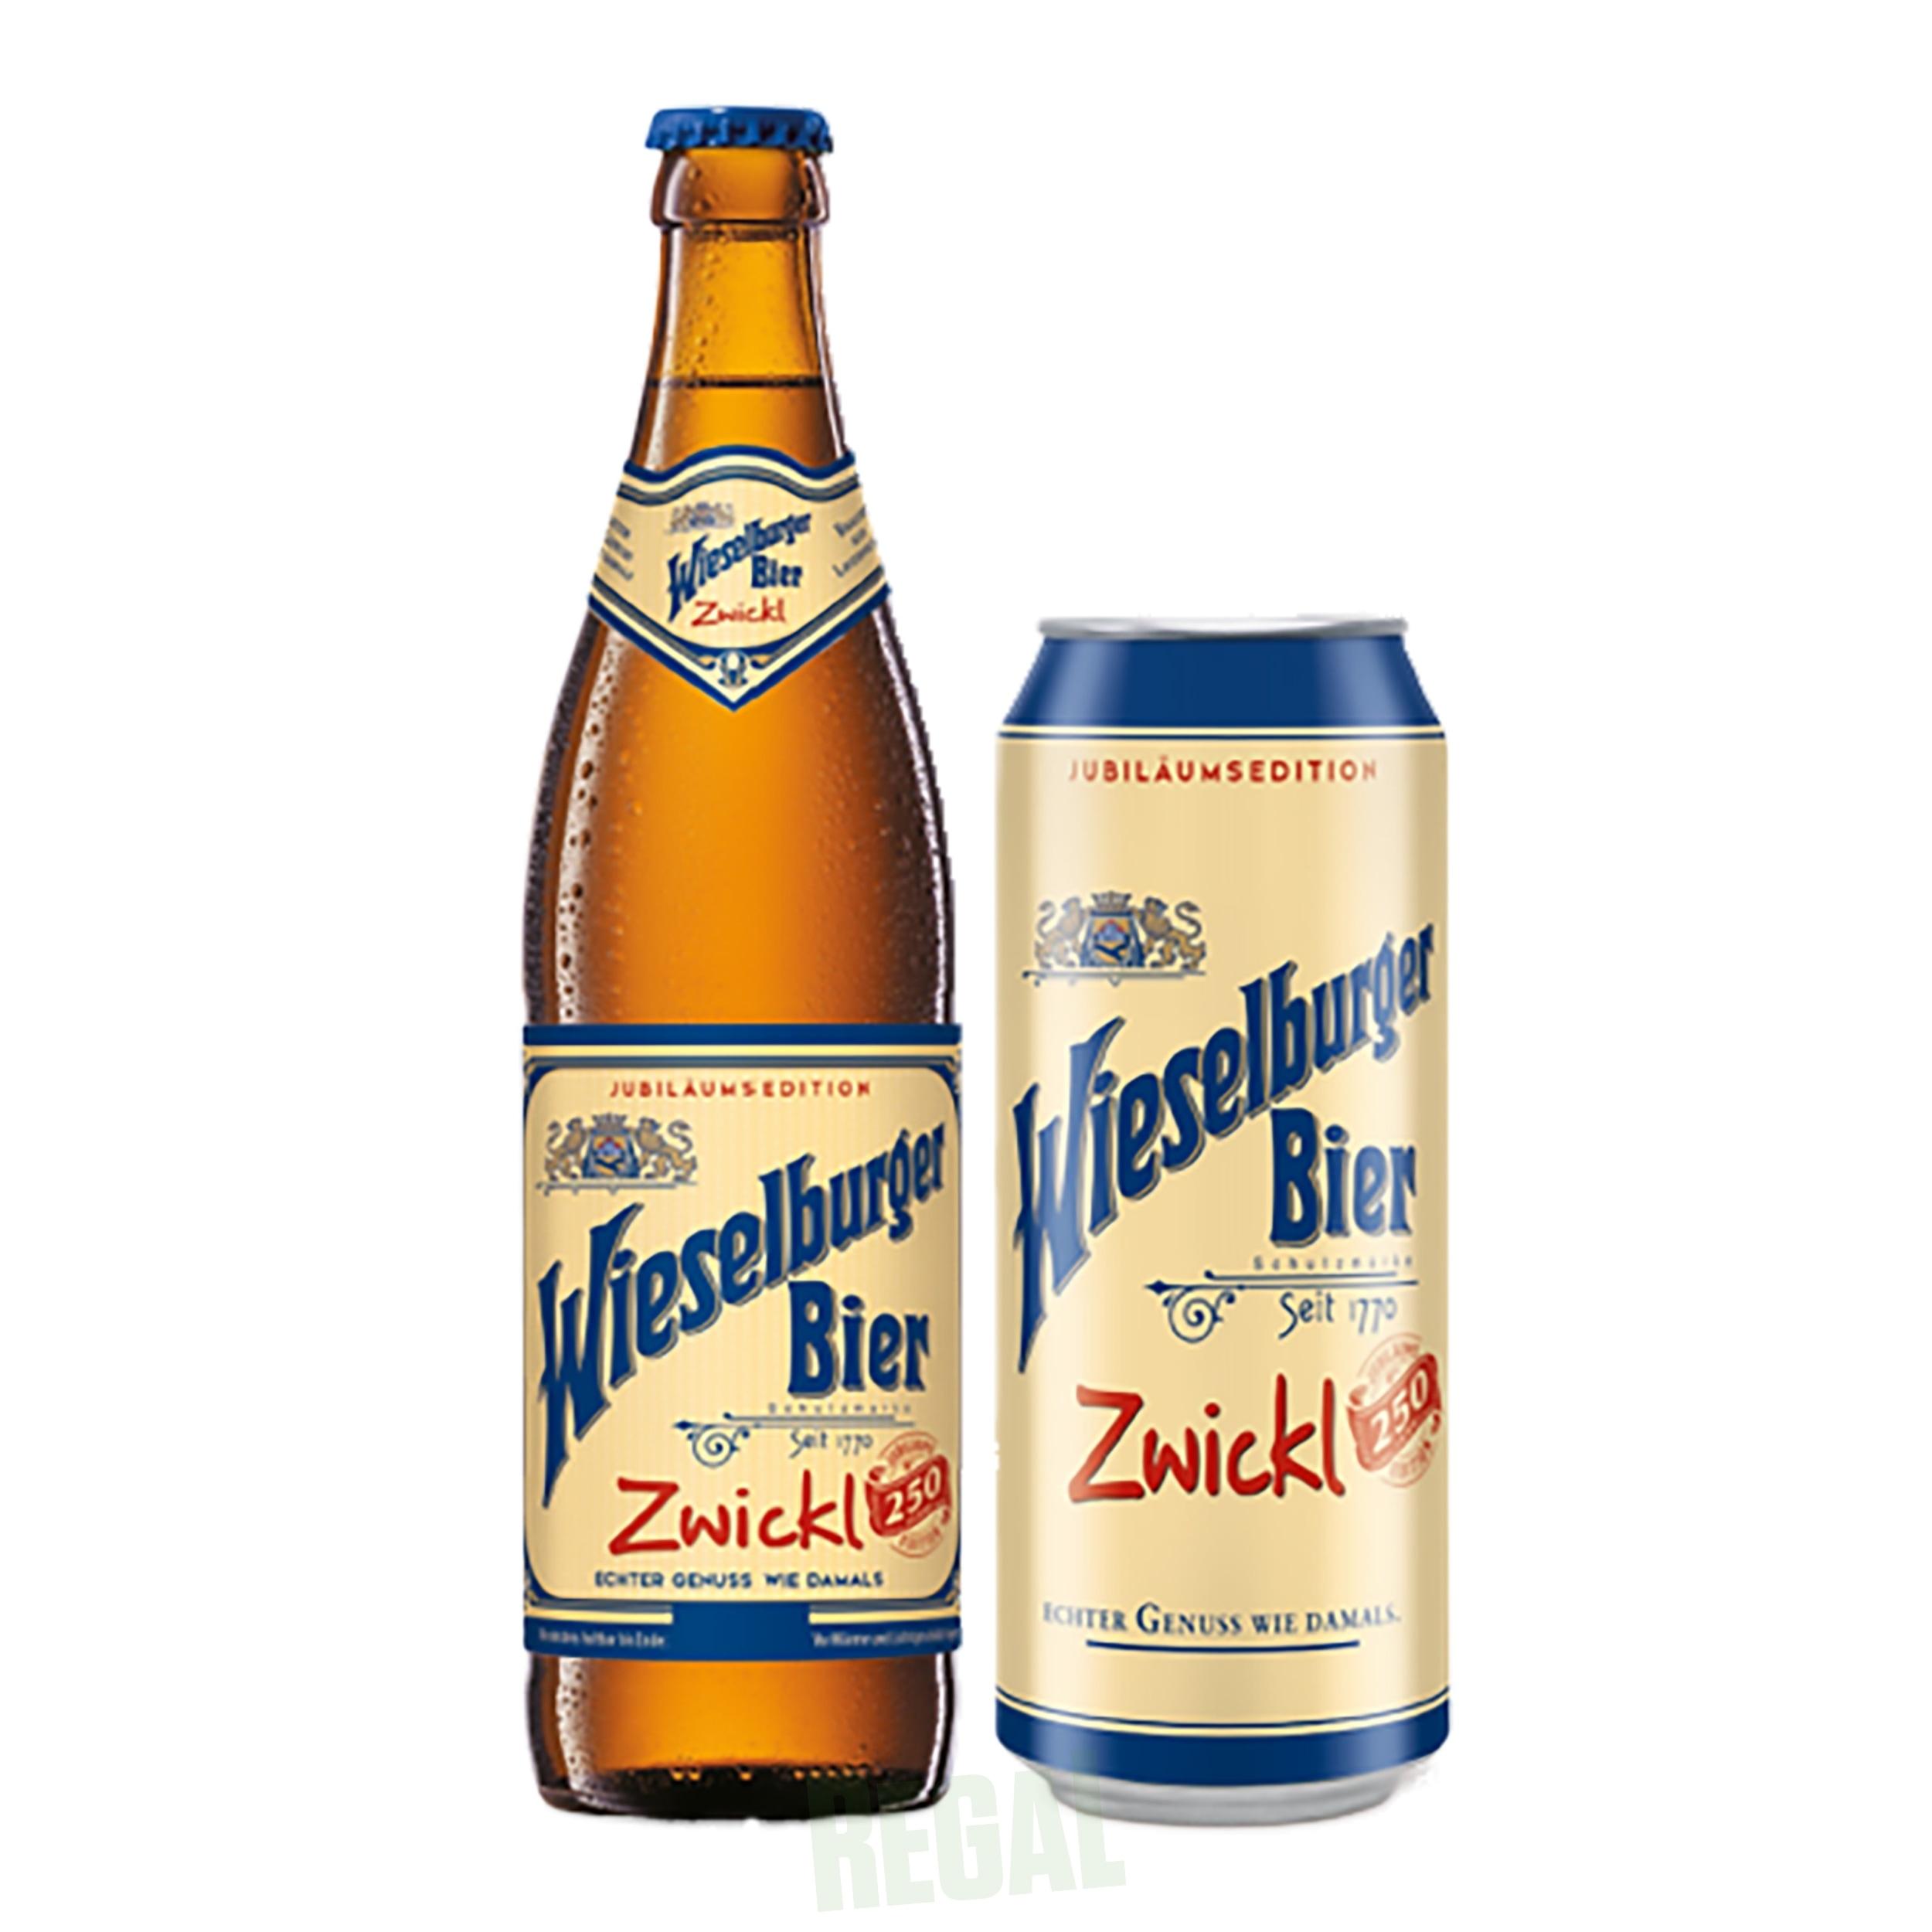 Wieselburger Zwickl